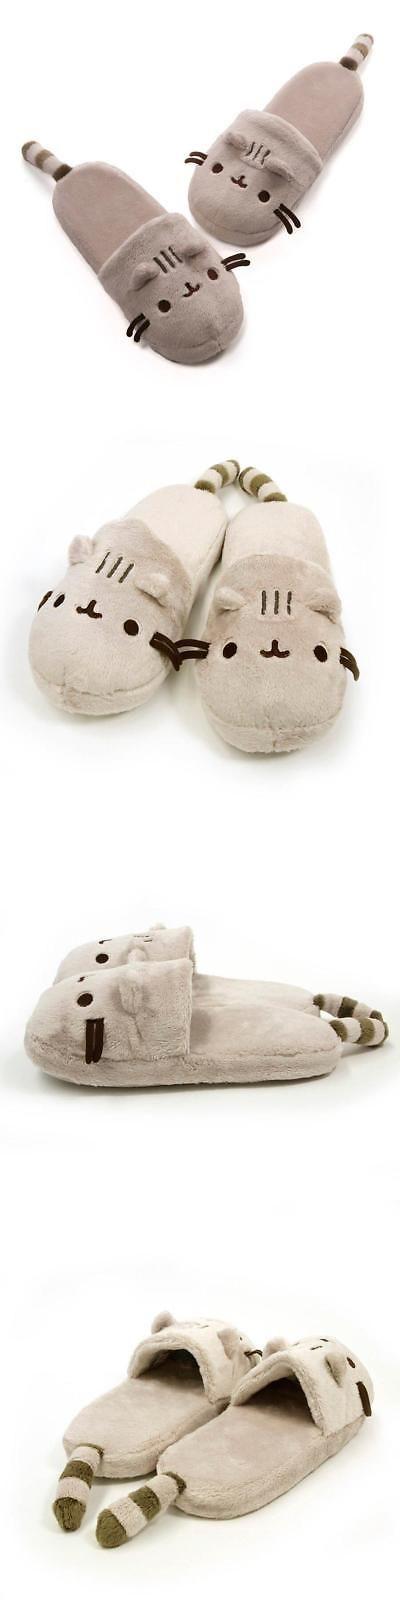 7db37dde3693 Gund 2598  Gund Pusheen Cat Plush Stuffed Animal Slippers